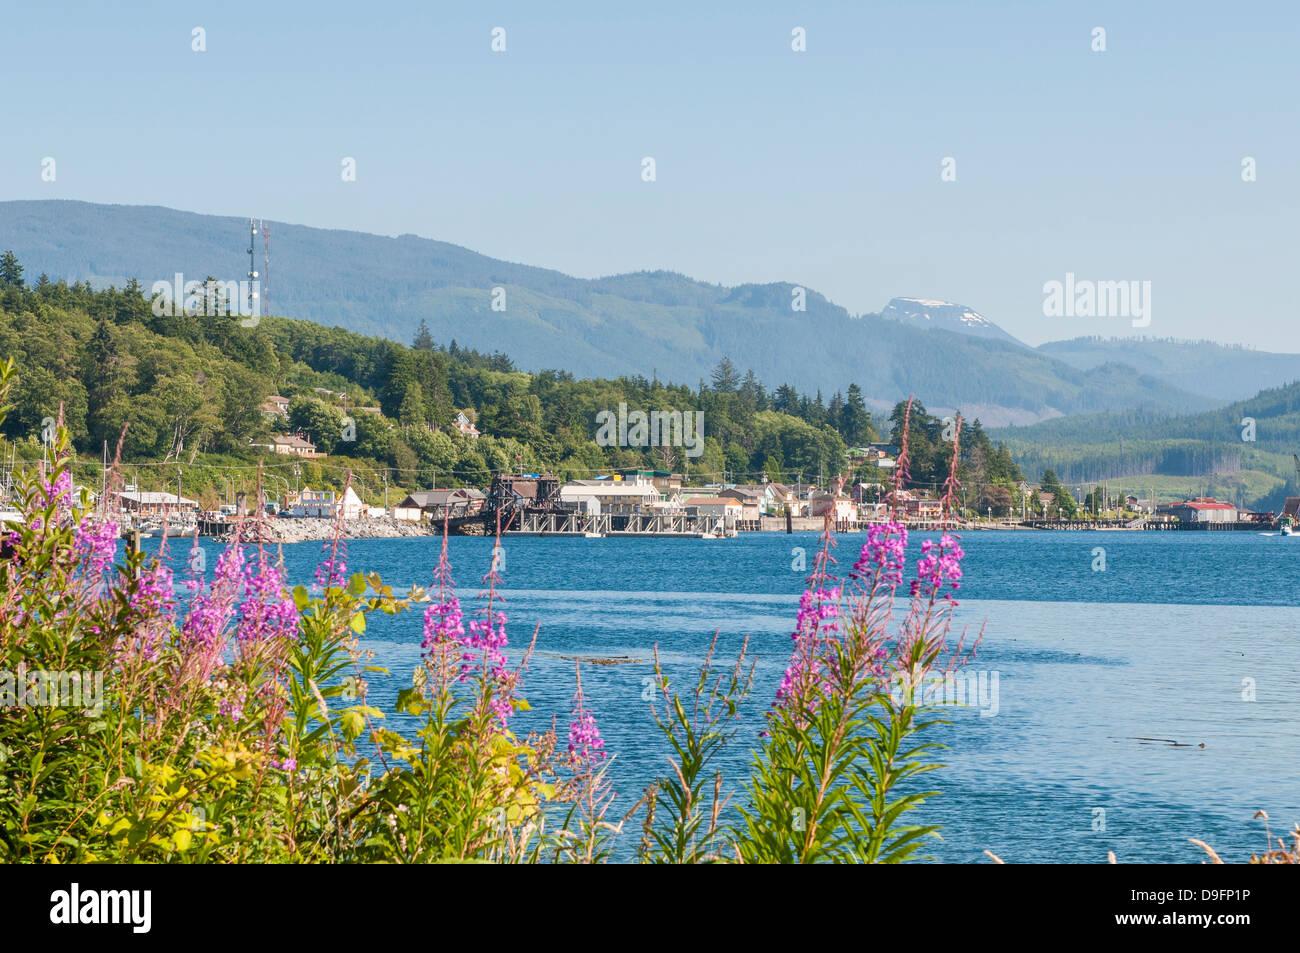 Alert Bay harbour, British Columbia, Canada - Stock Image